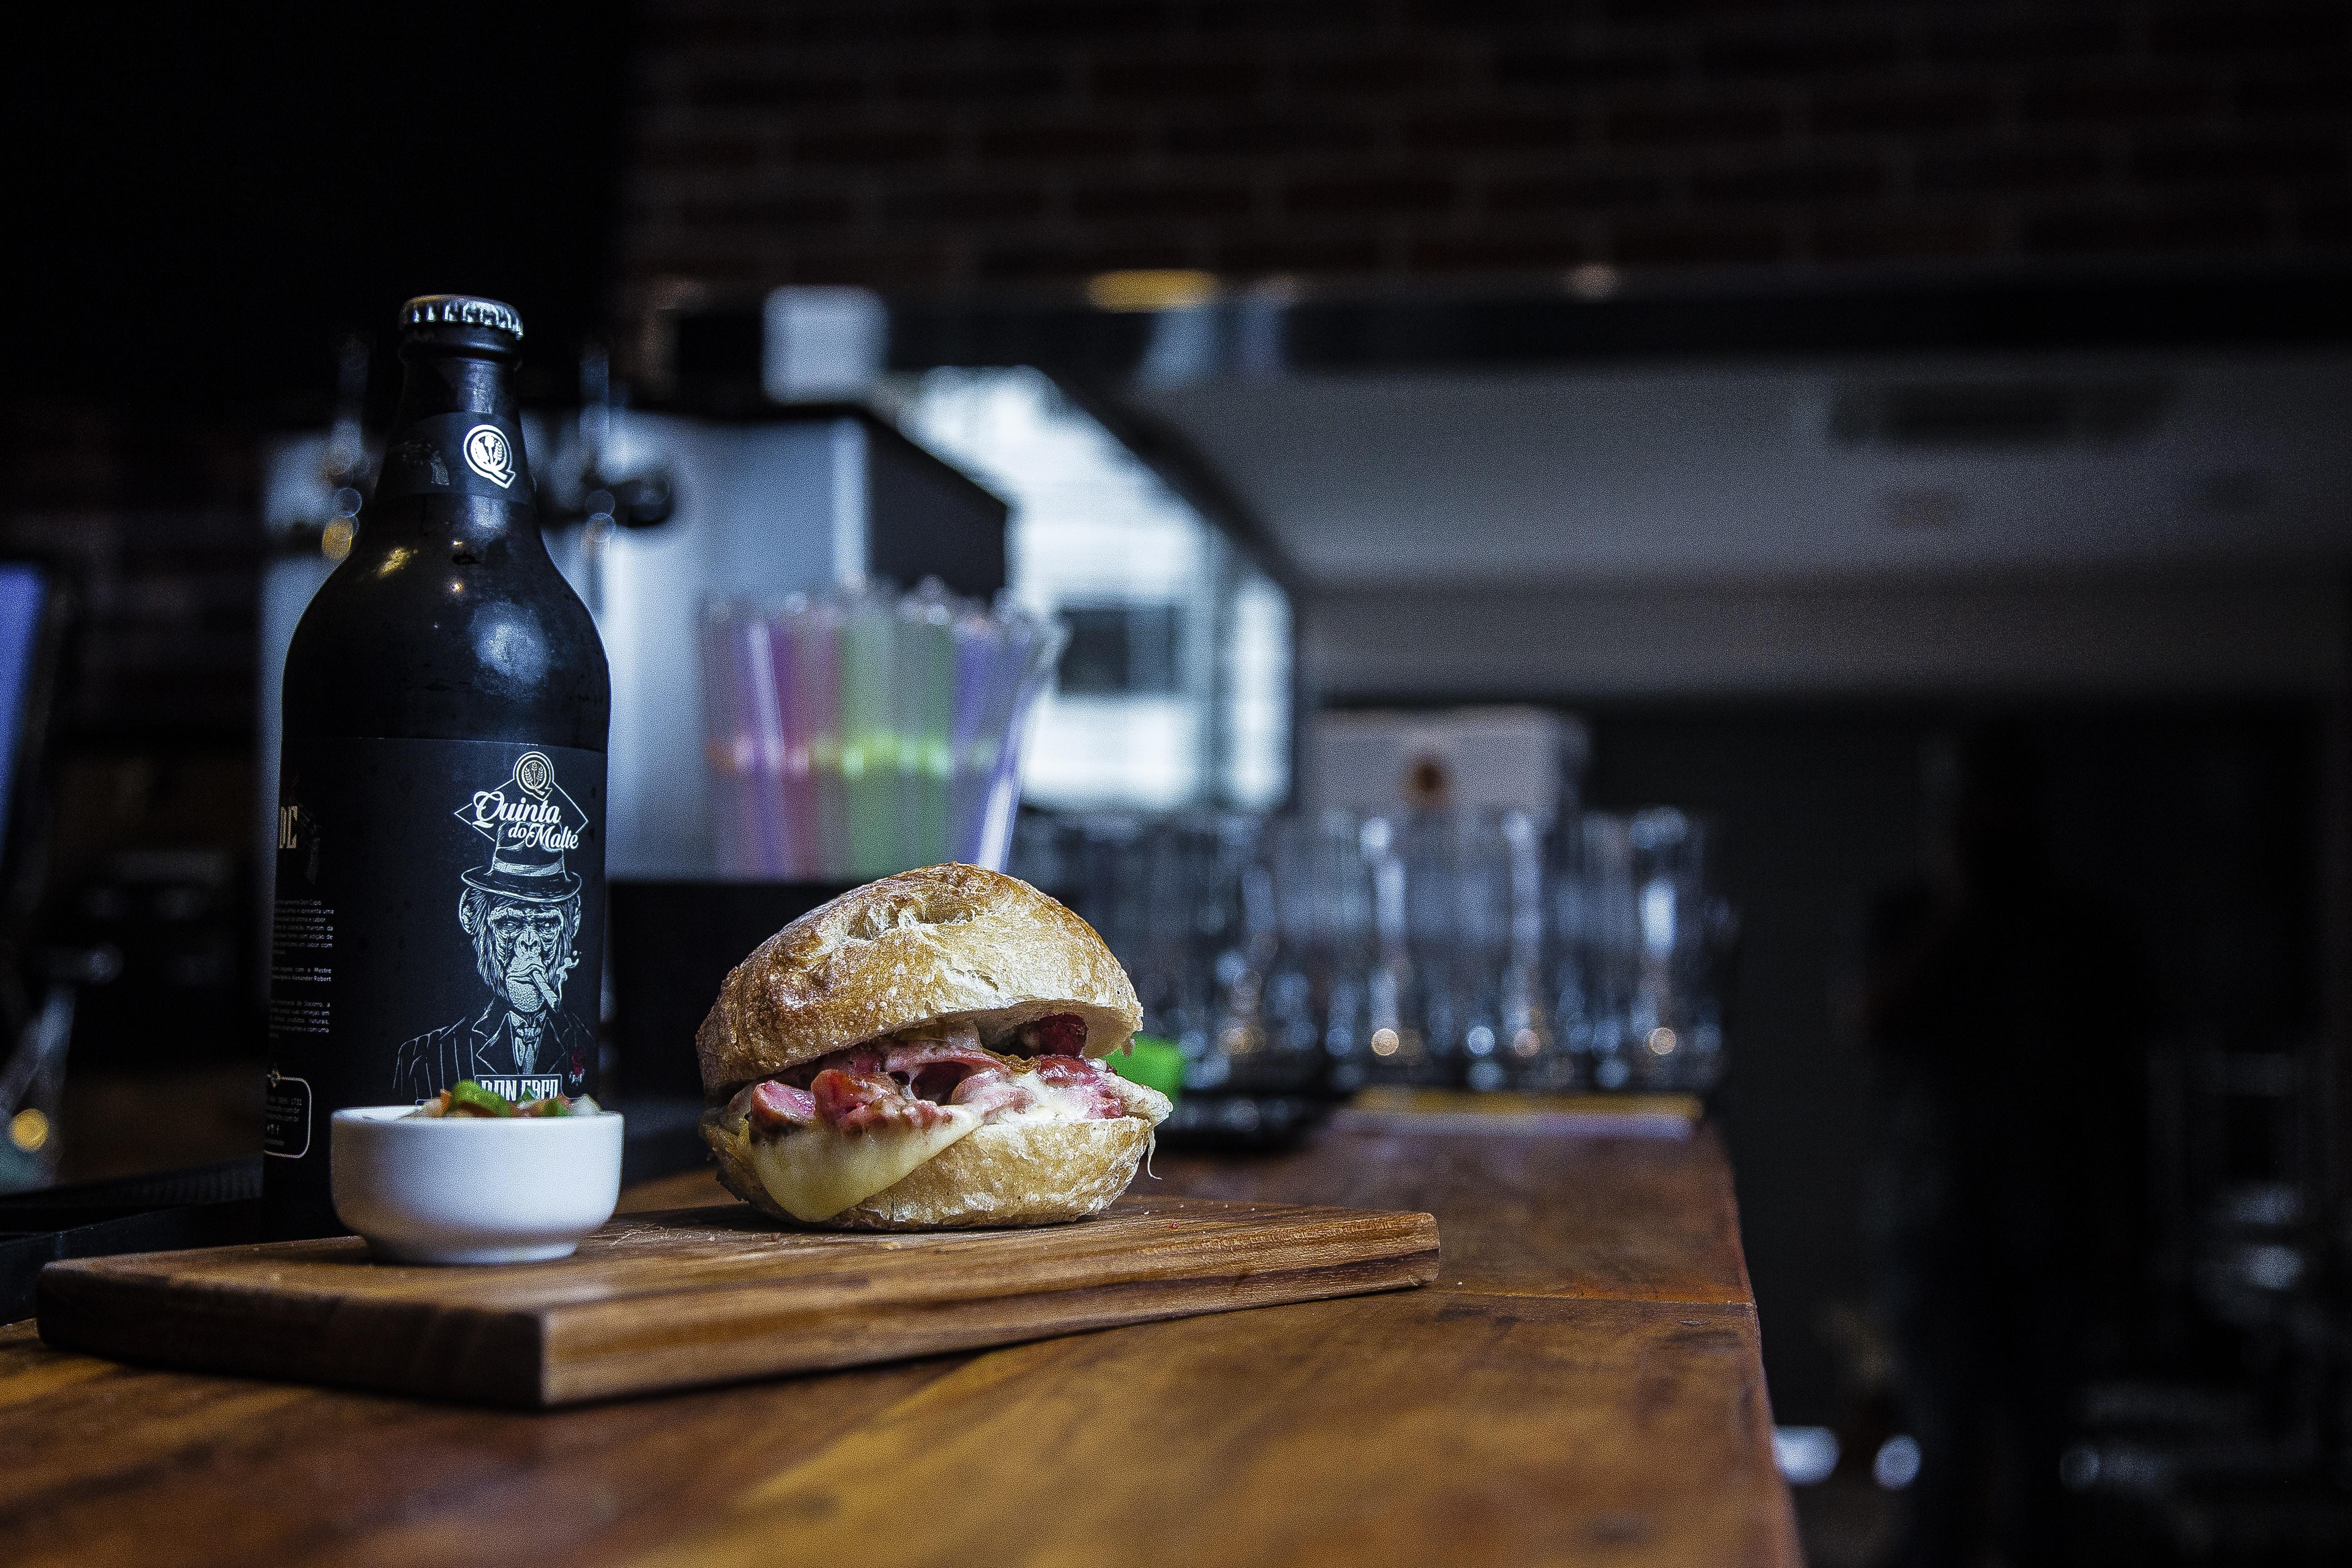 hamburger on chopping board near ceramic bowl and glass bottle